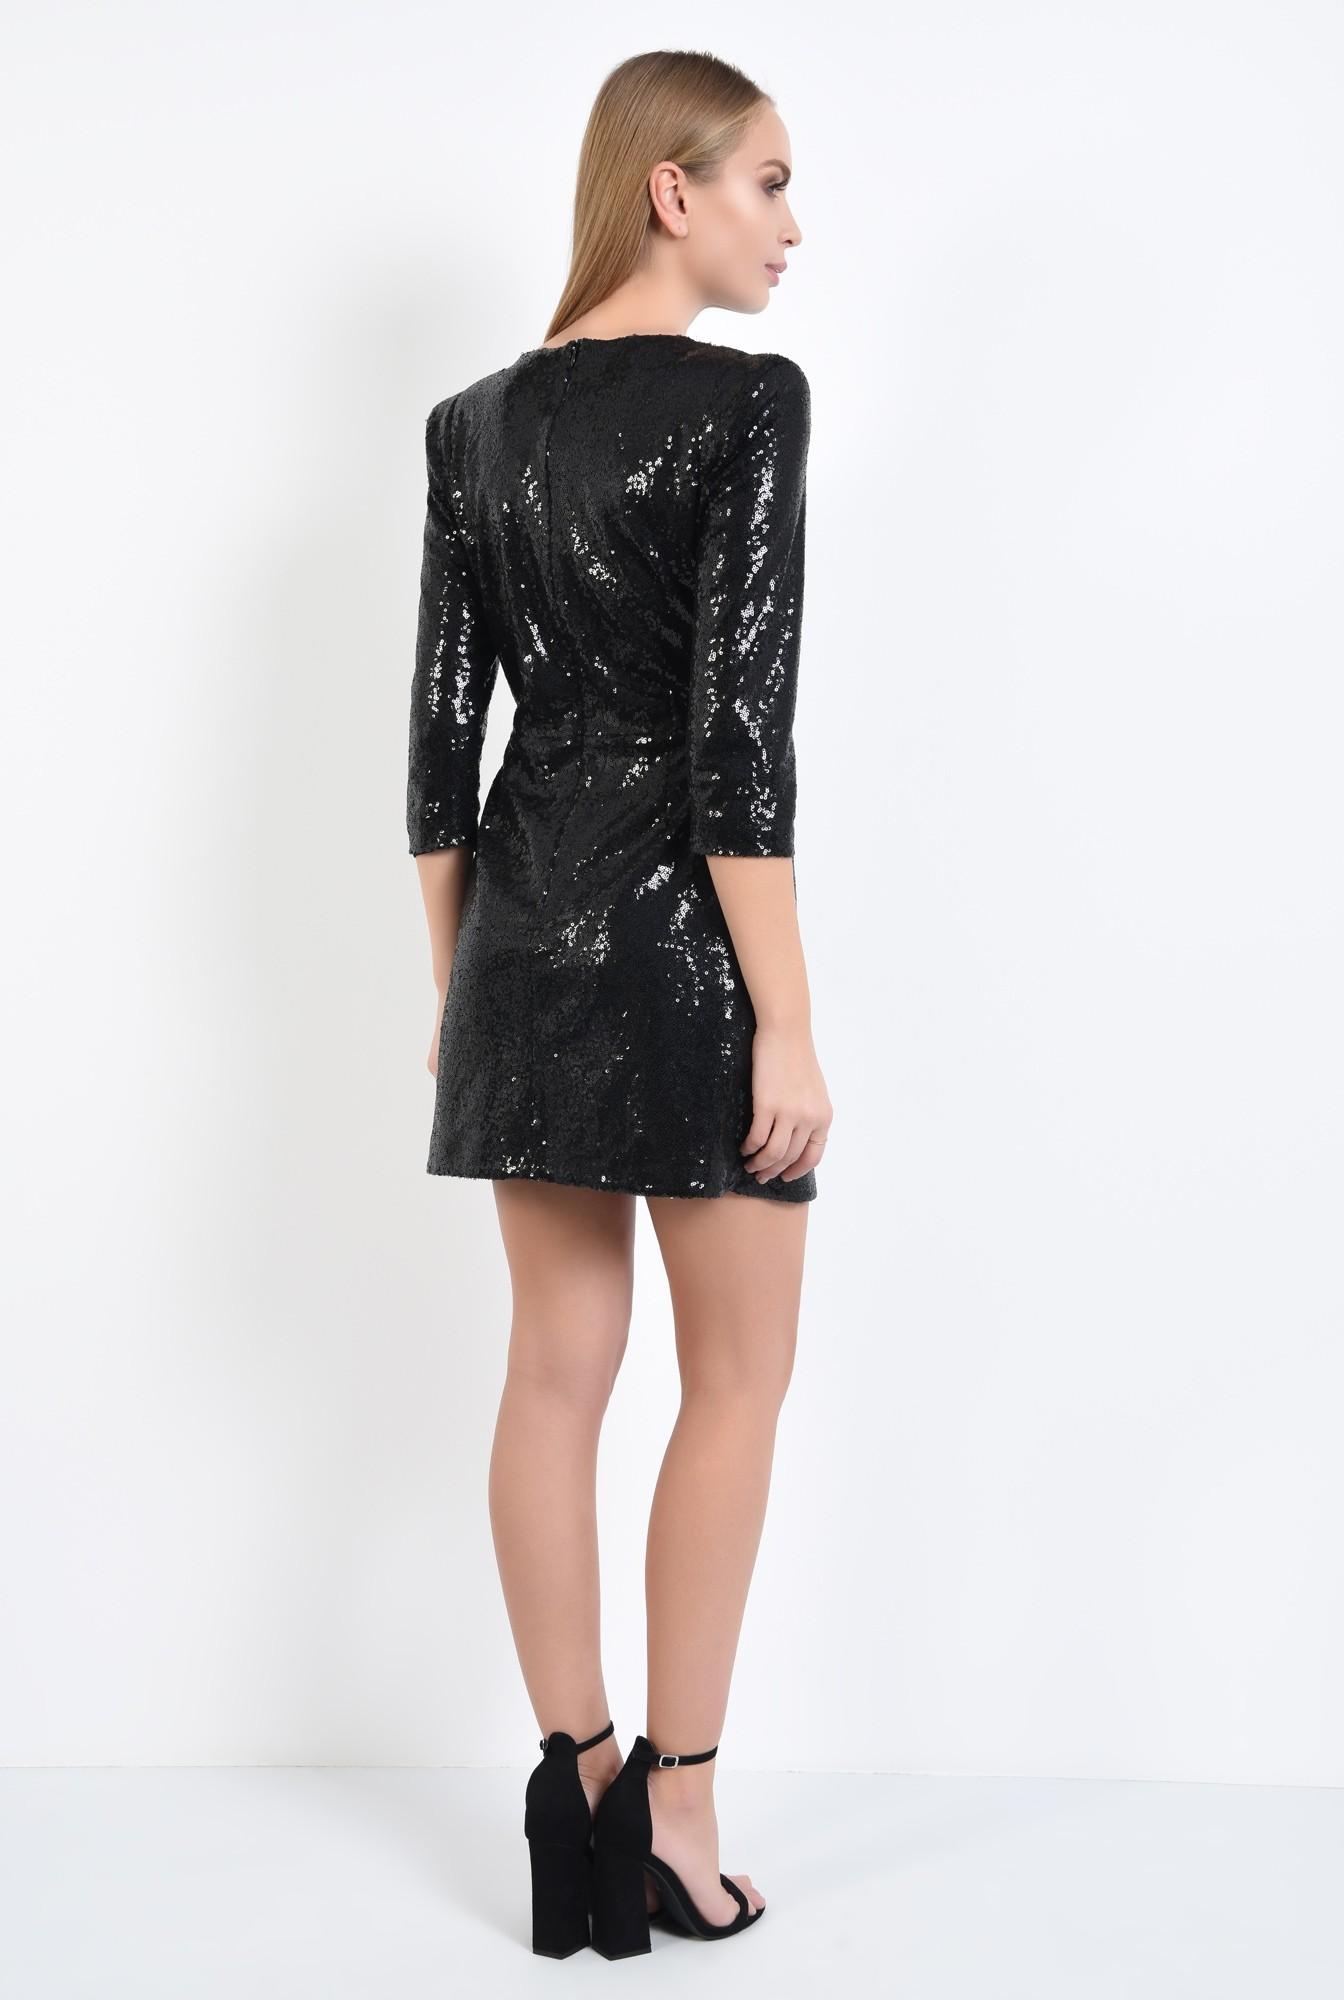 1 - rochie de ocazie, neagra, din paiete, cambrata, scurta